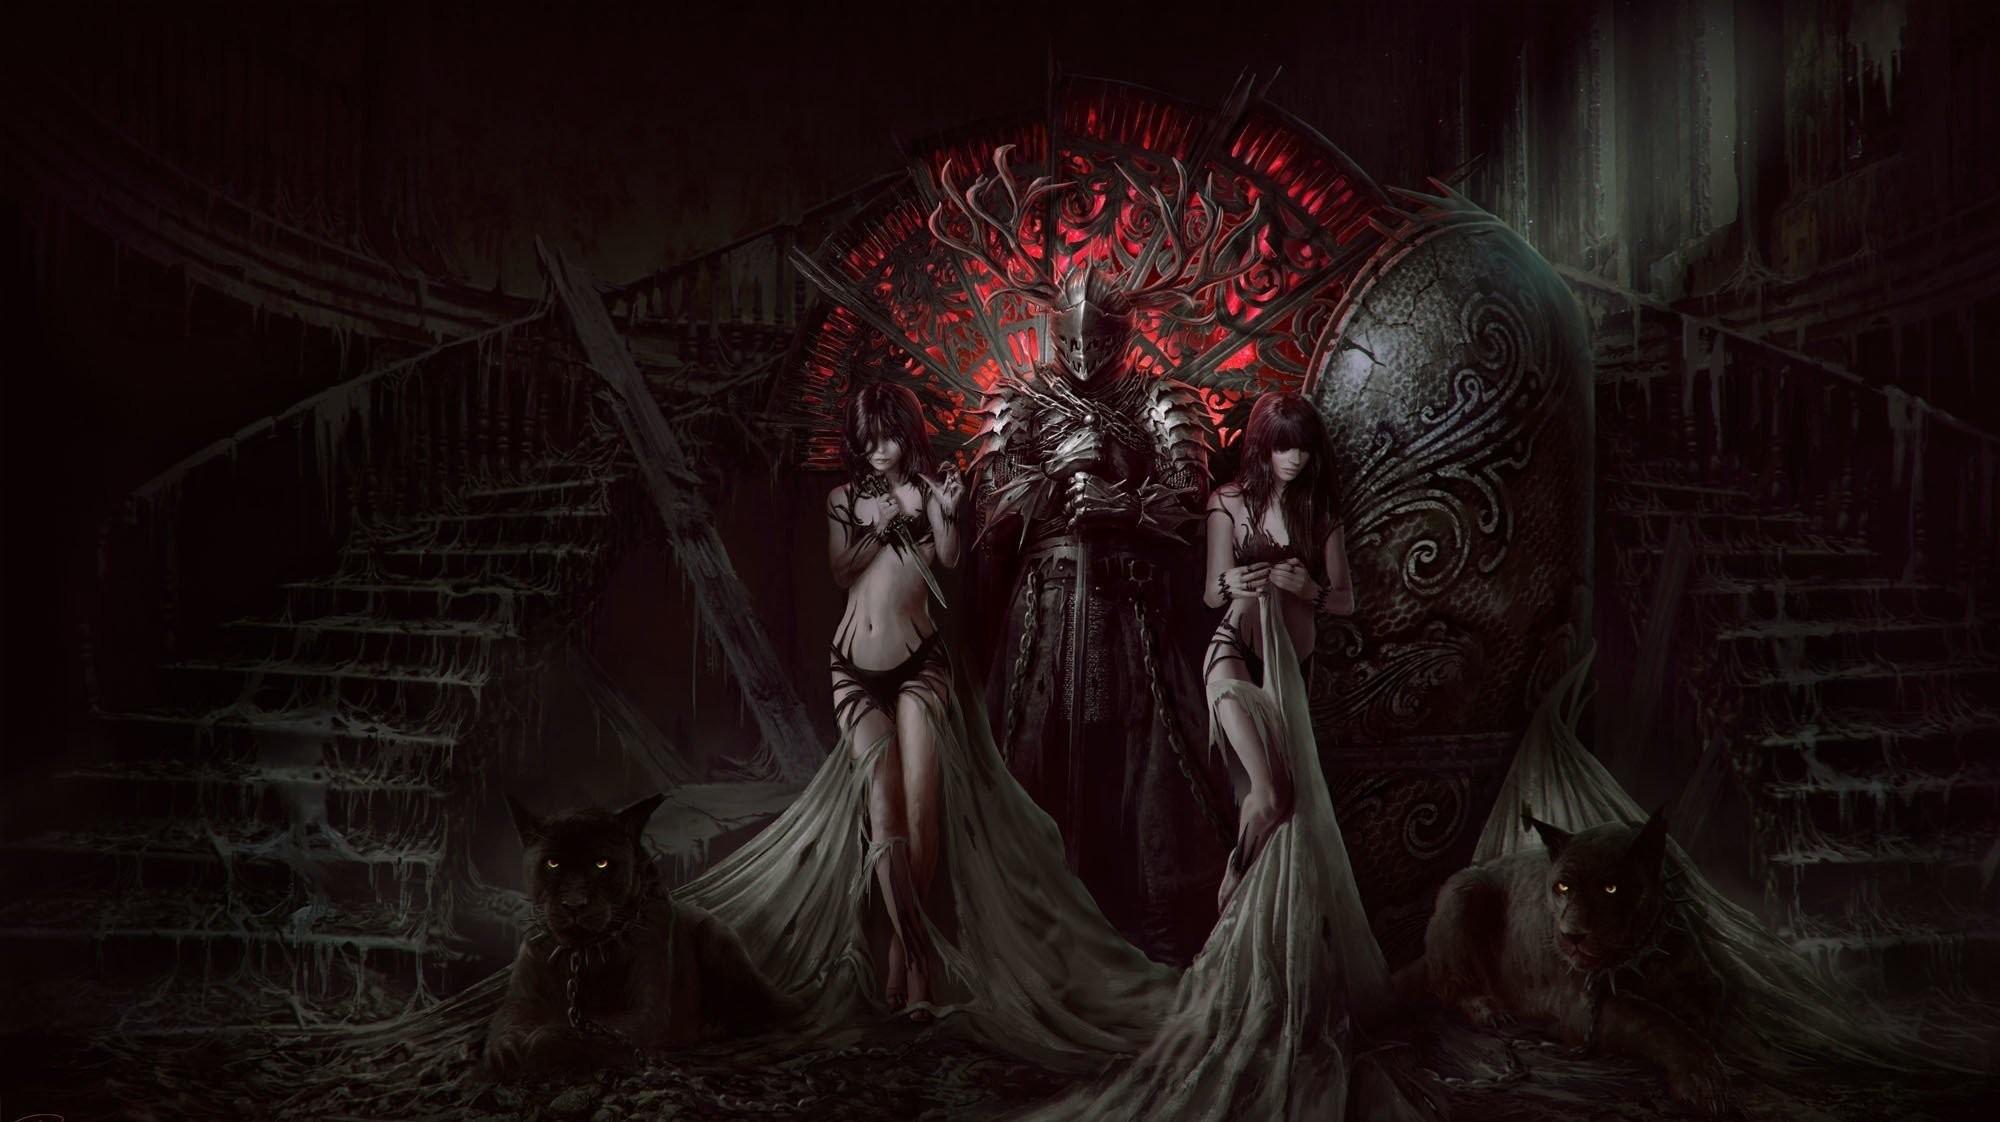 Fantasy – Dark Knight Black Demon Panther Stairs Girl Fantasy Wallpaper